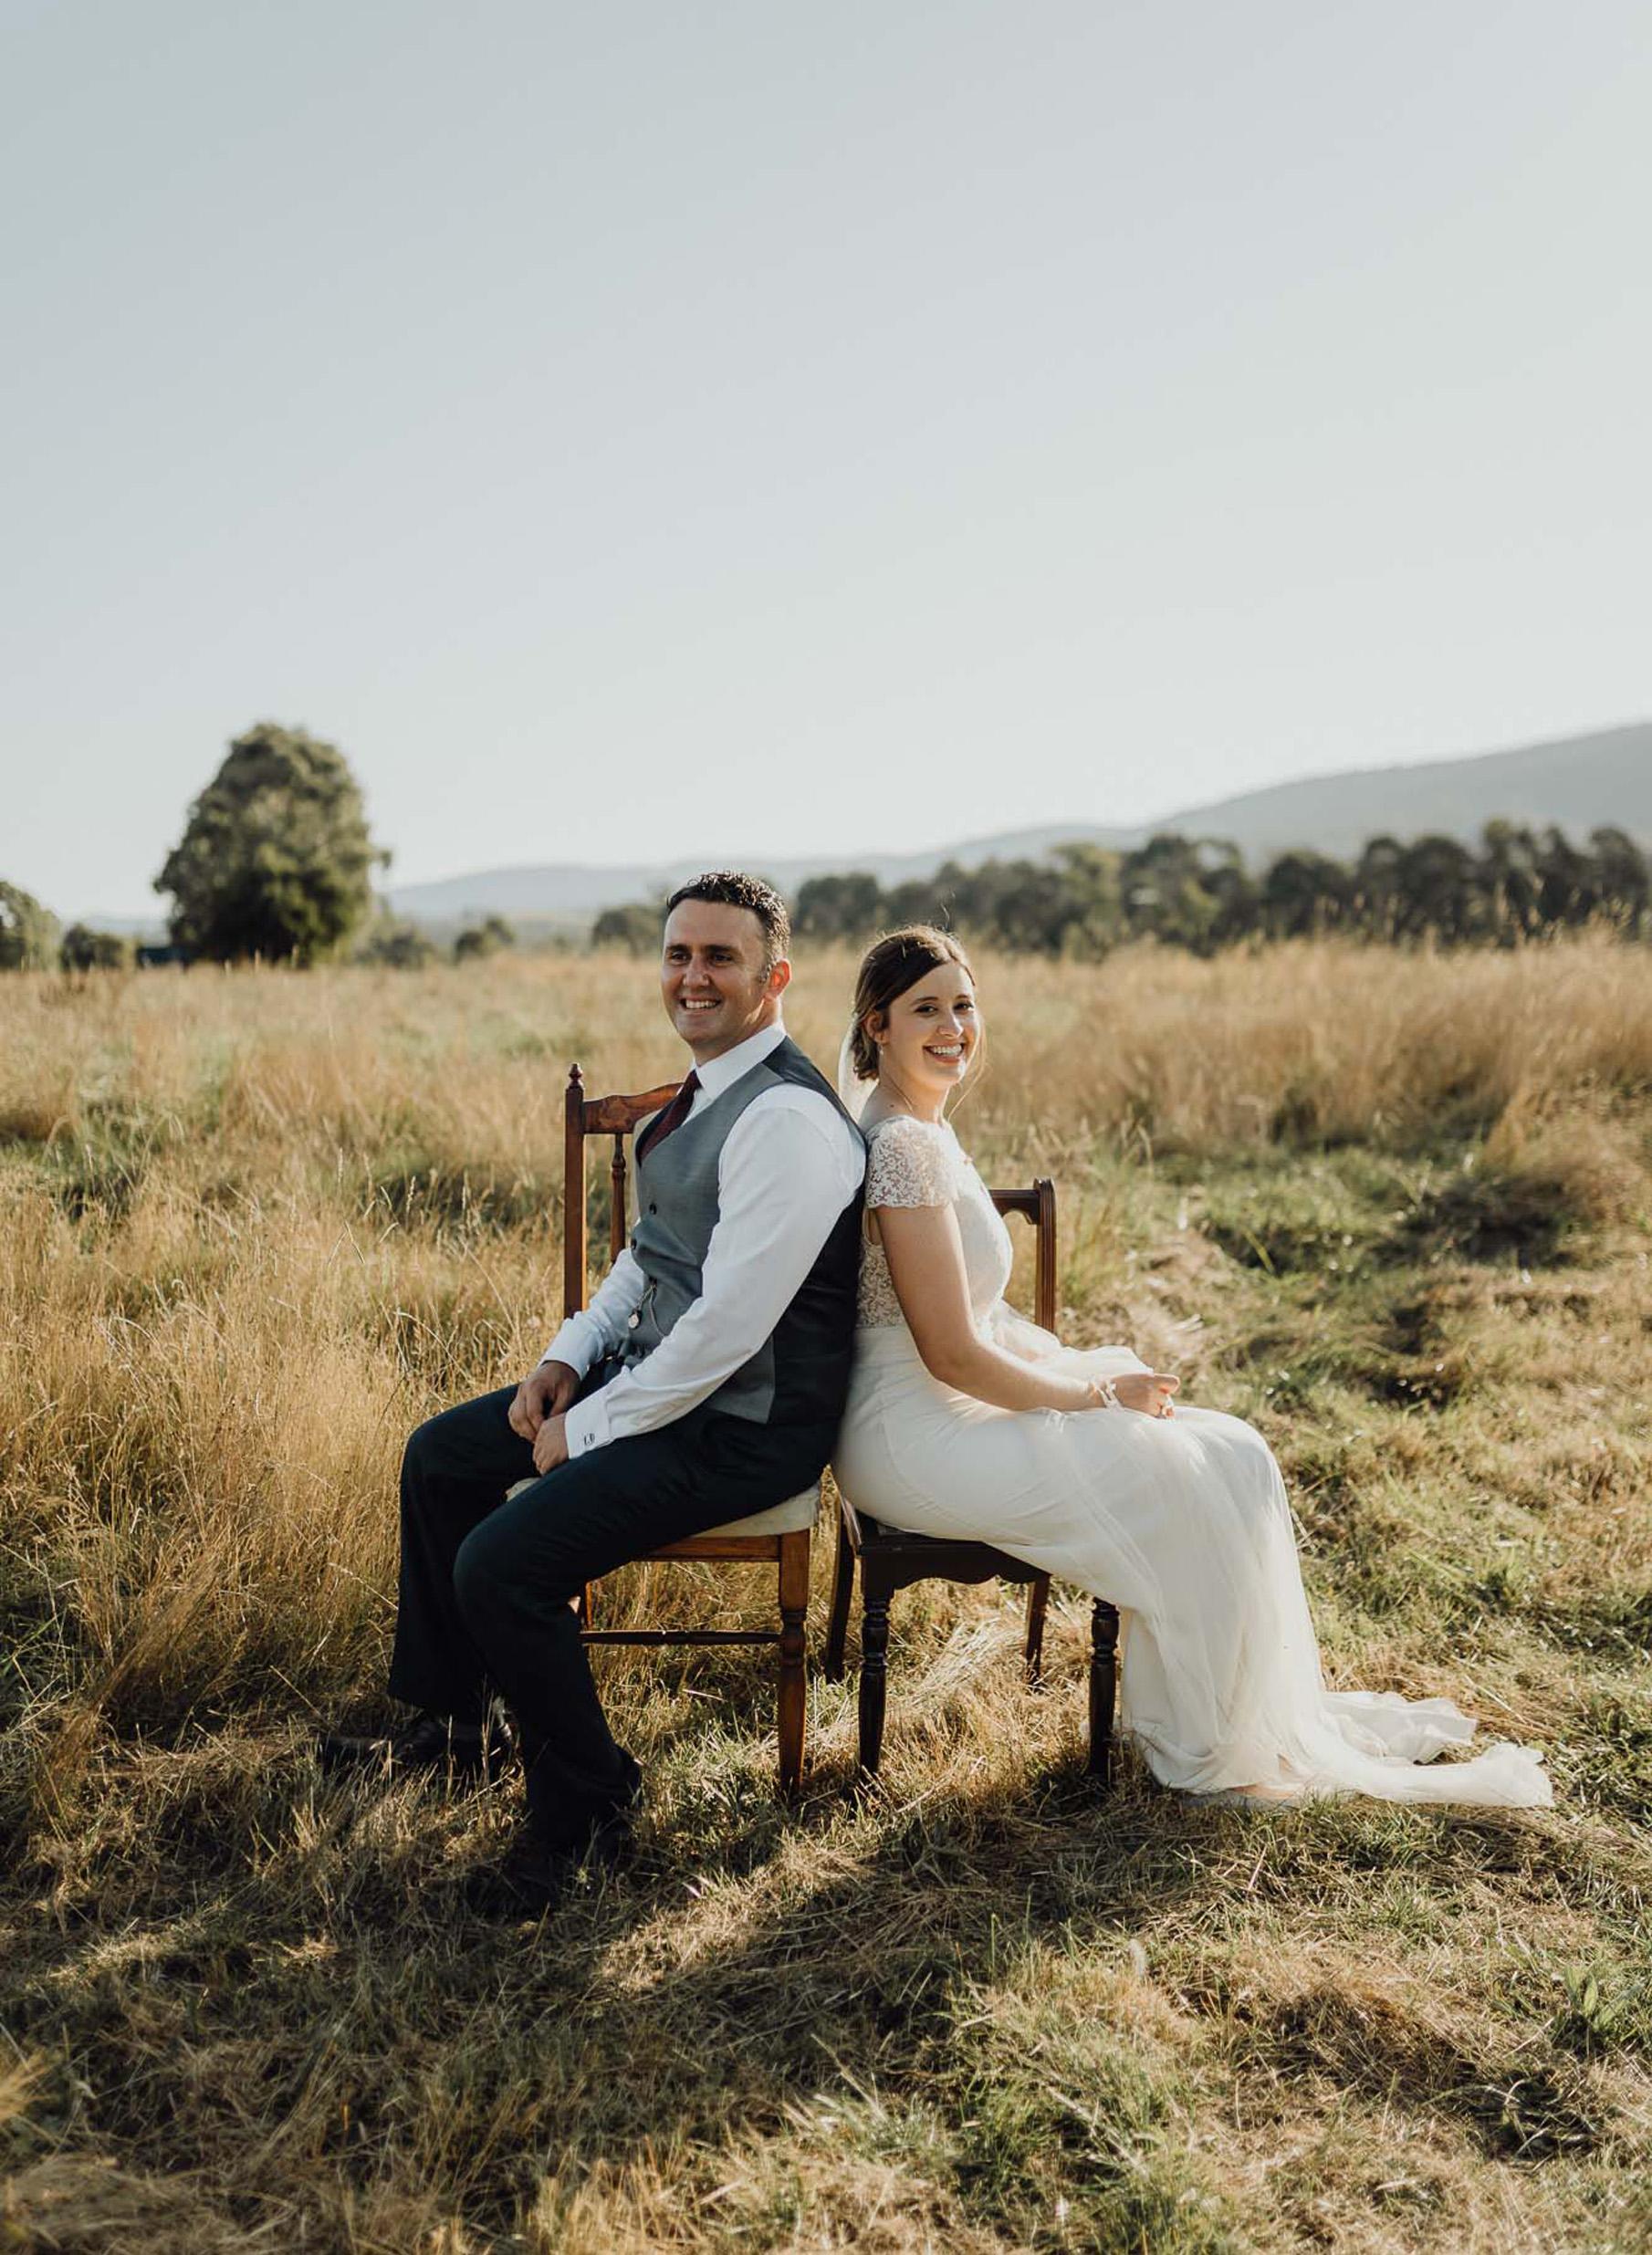 Wedding Photographer Hobart Across the Forest